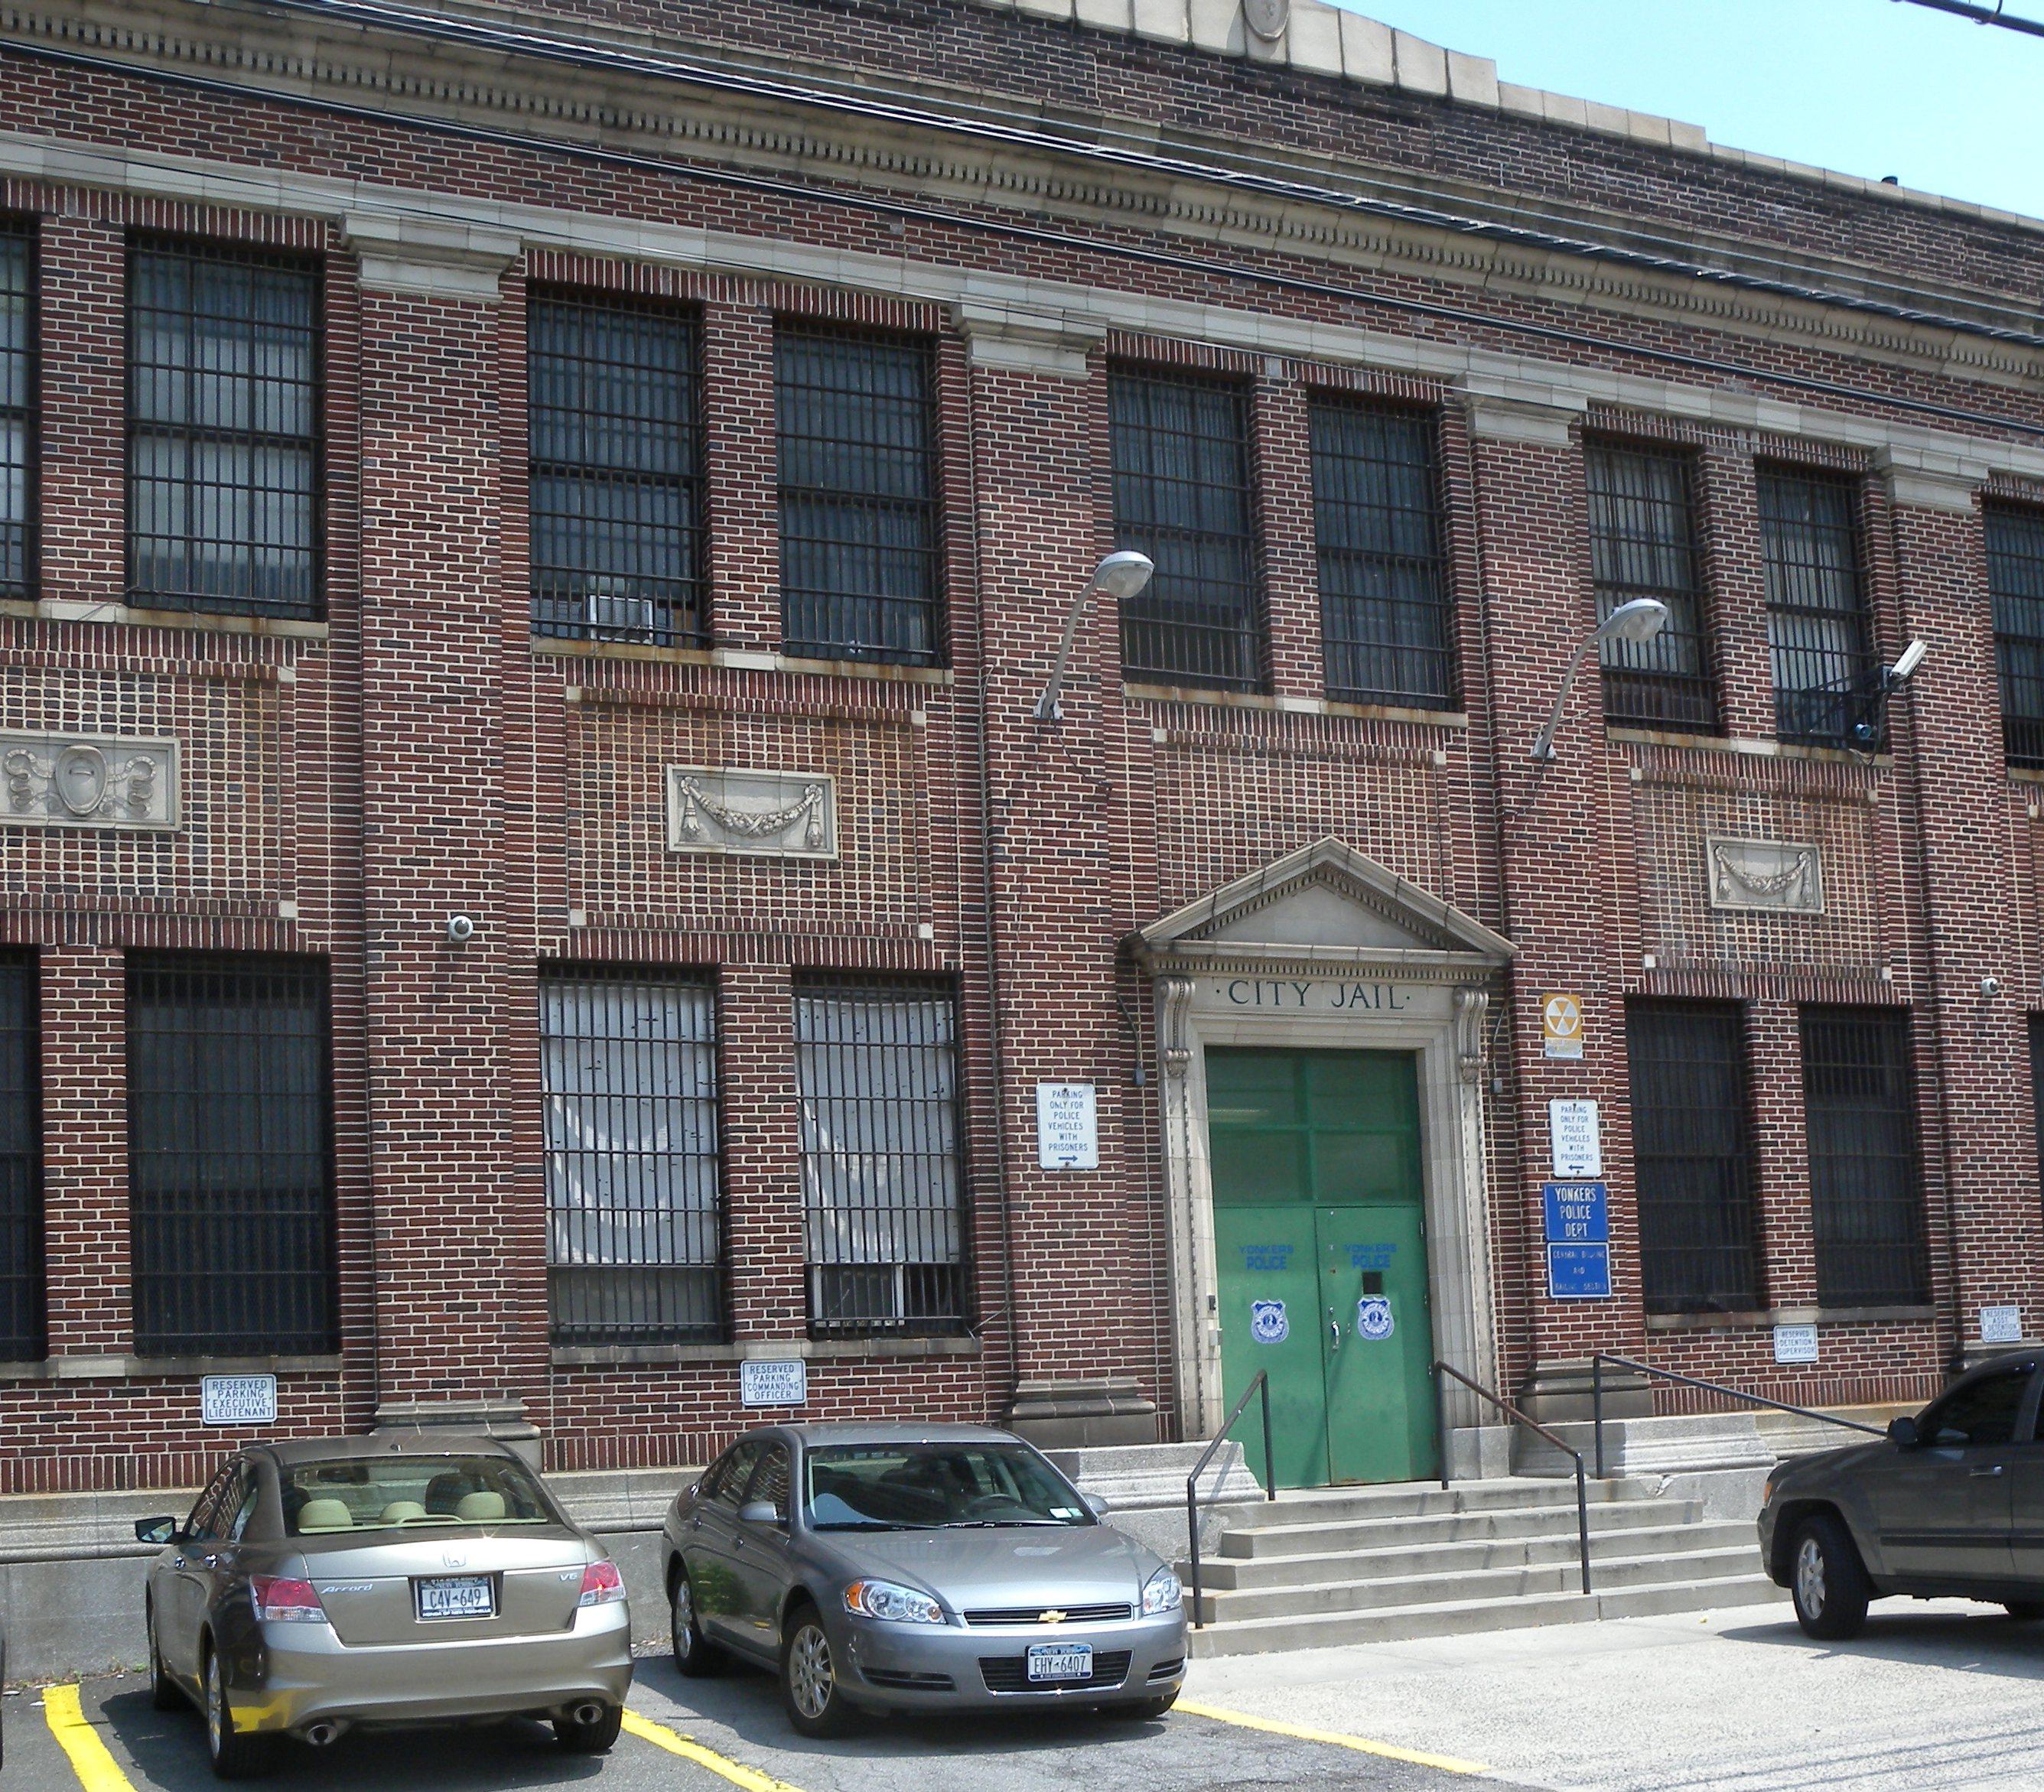 Yonkers City Jail